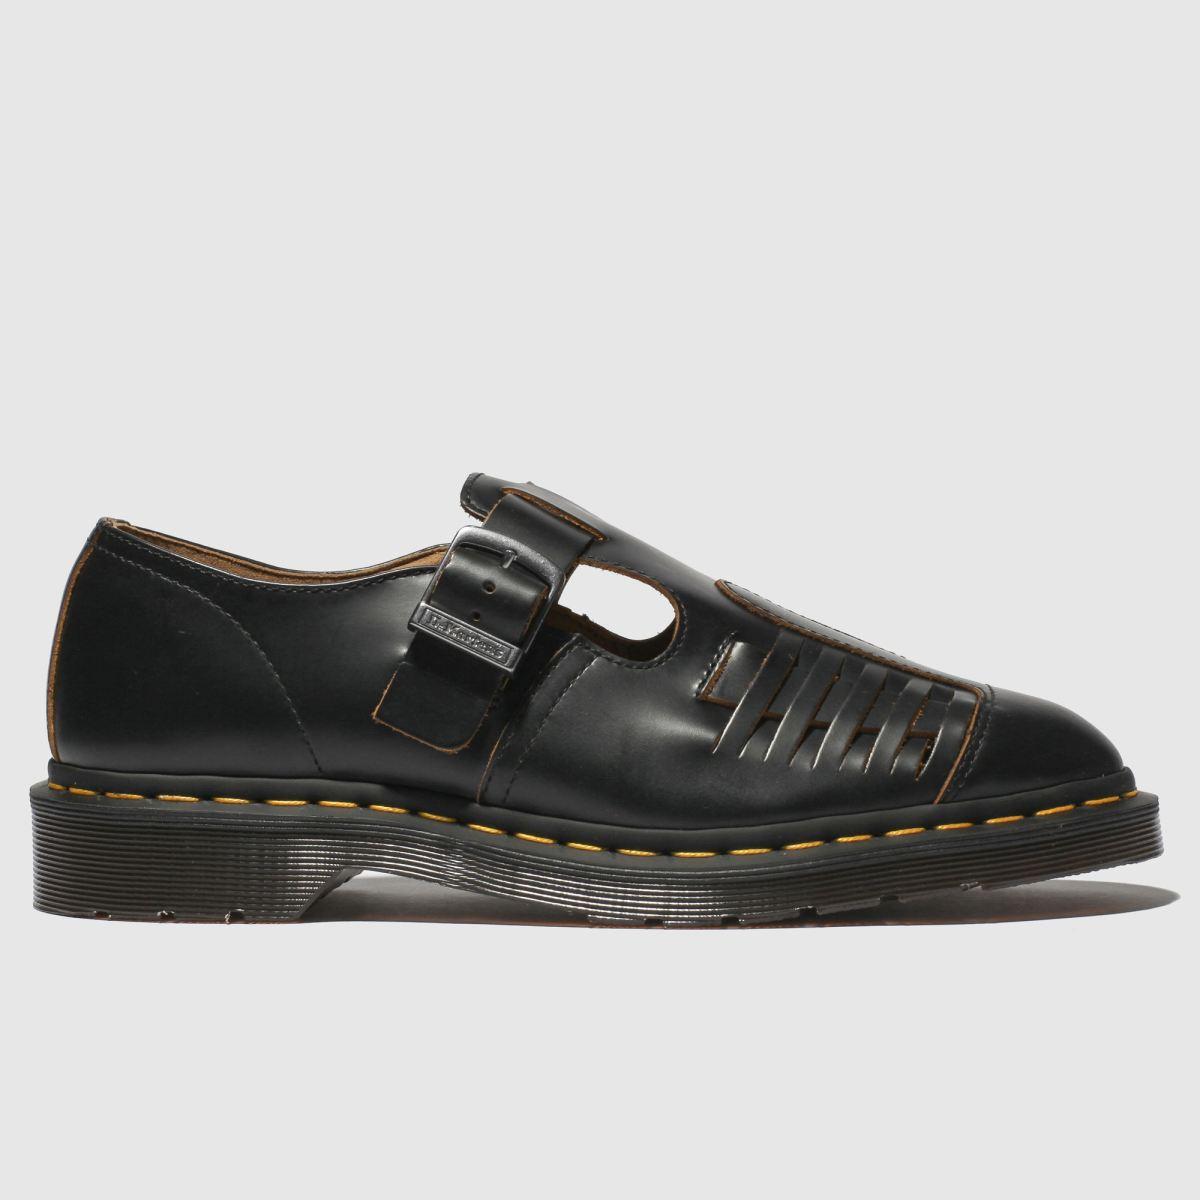 Dr Martens Black Mica Shoes